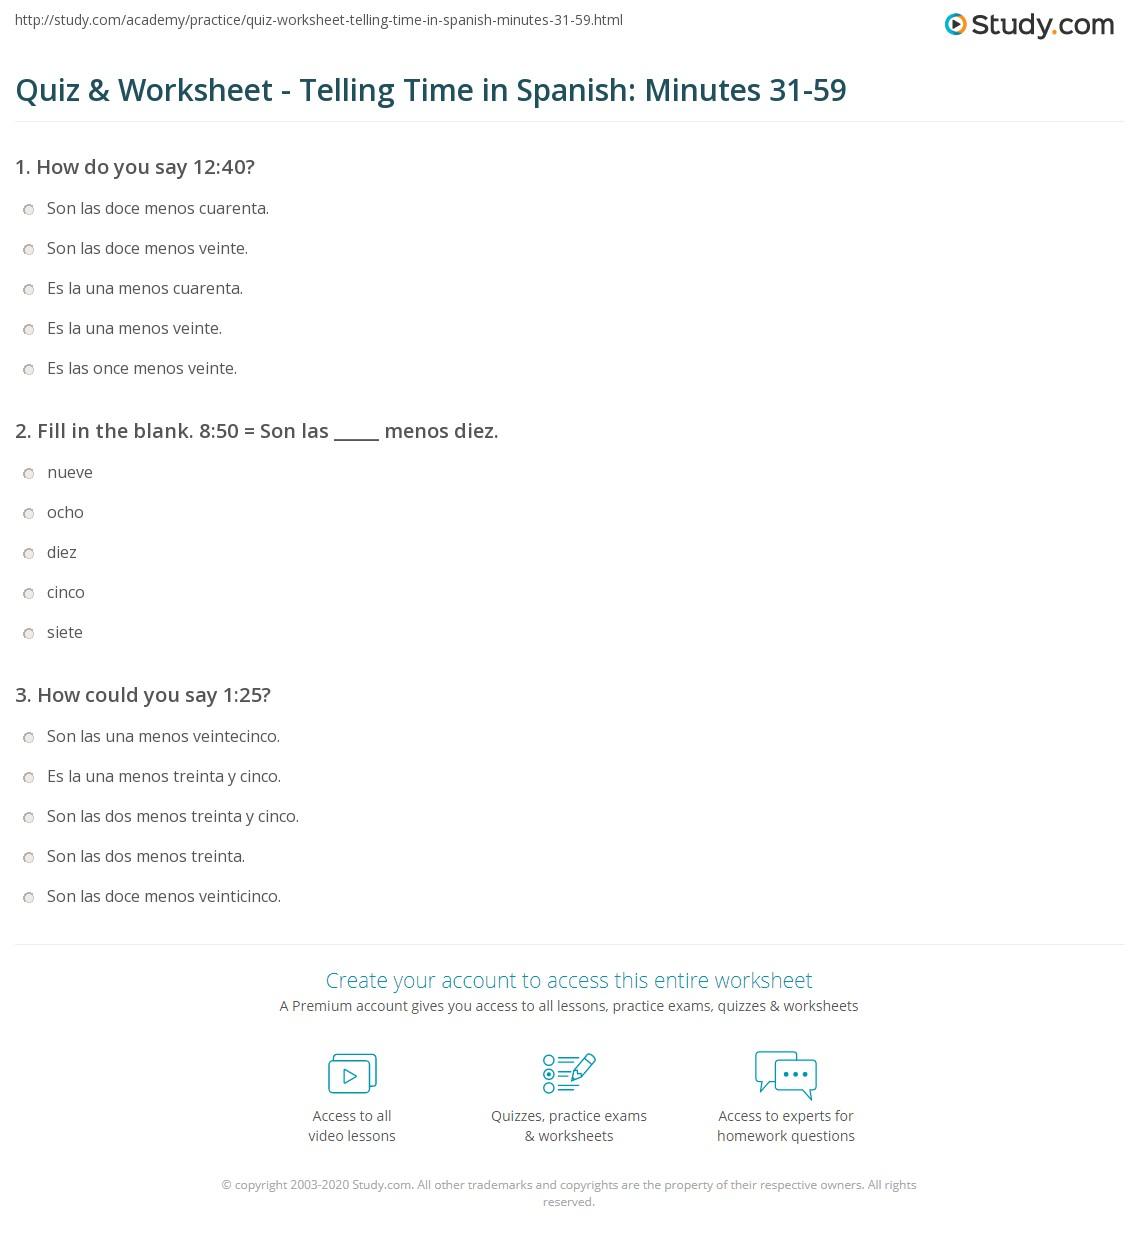 Worksheets Time In Spanish Worksheet quiz worksheet telling time in spanish minutes 31 59 study com print the worksheet